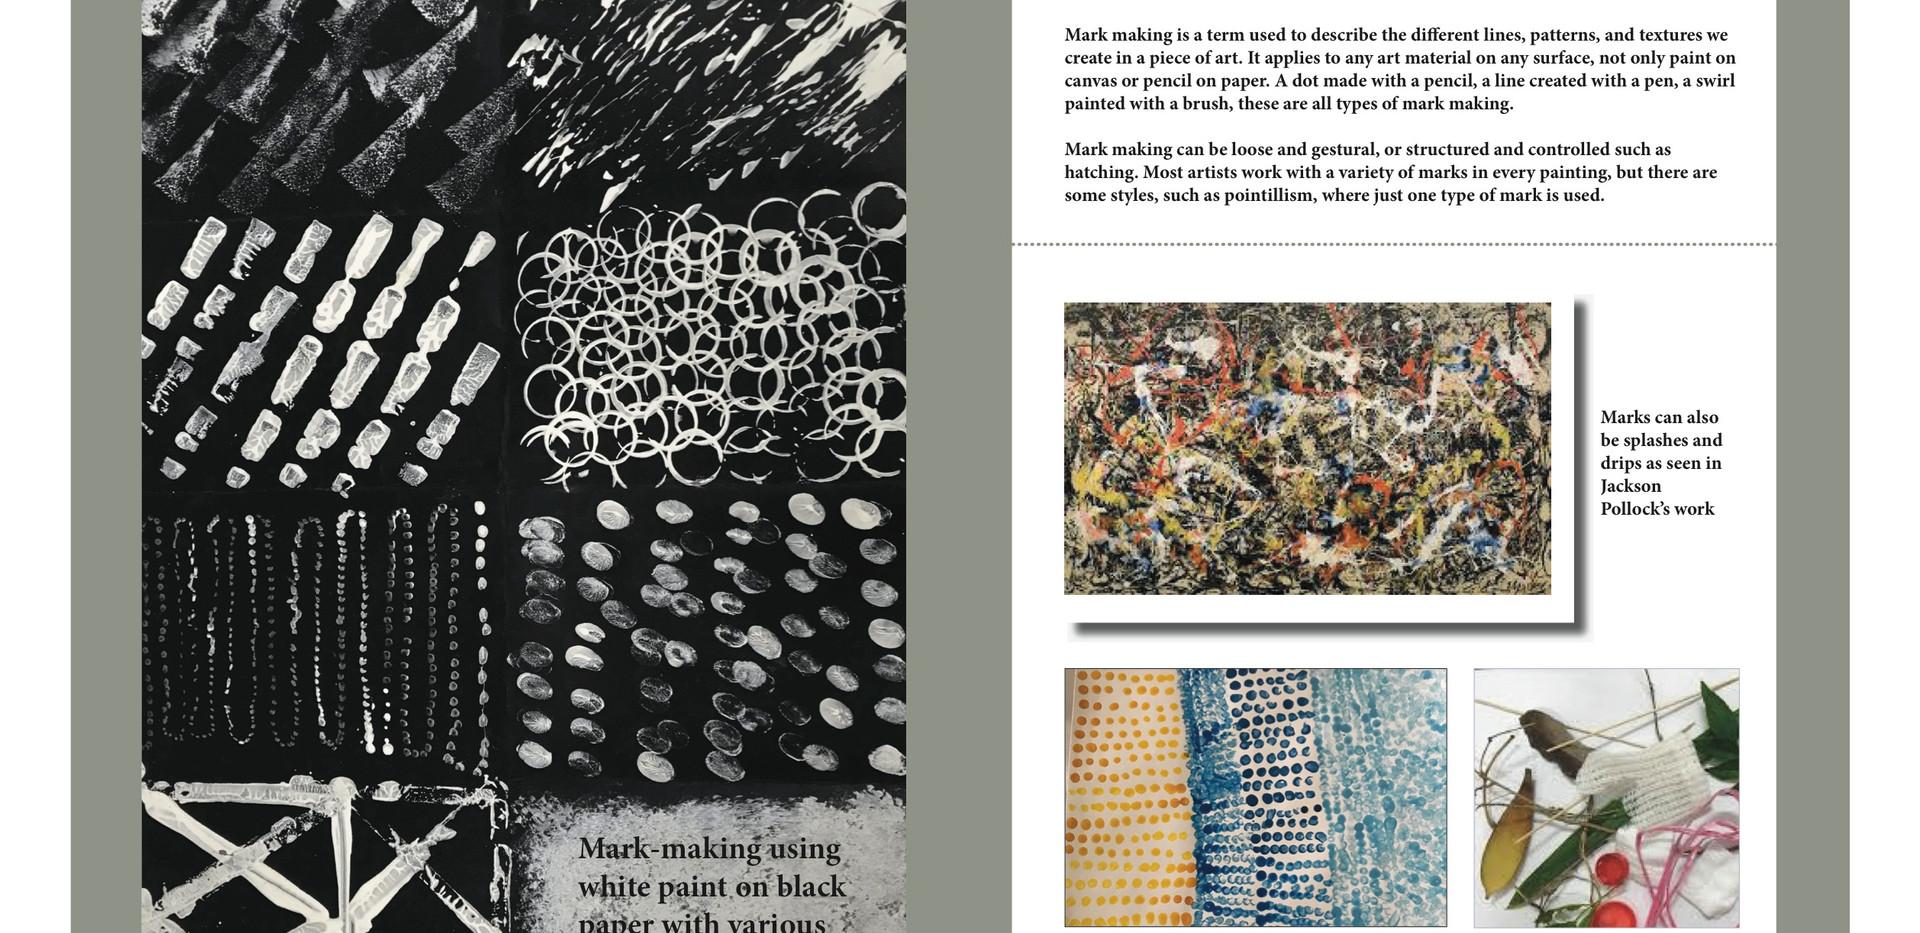 DIGITAL_NOTEBOOK_ART_ELEMENTS copy 7.jpg